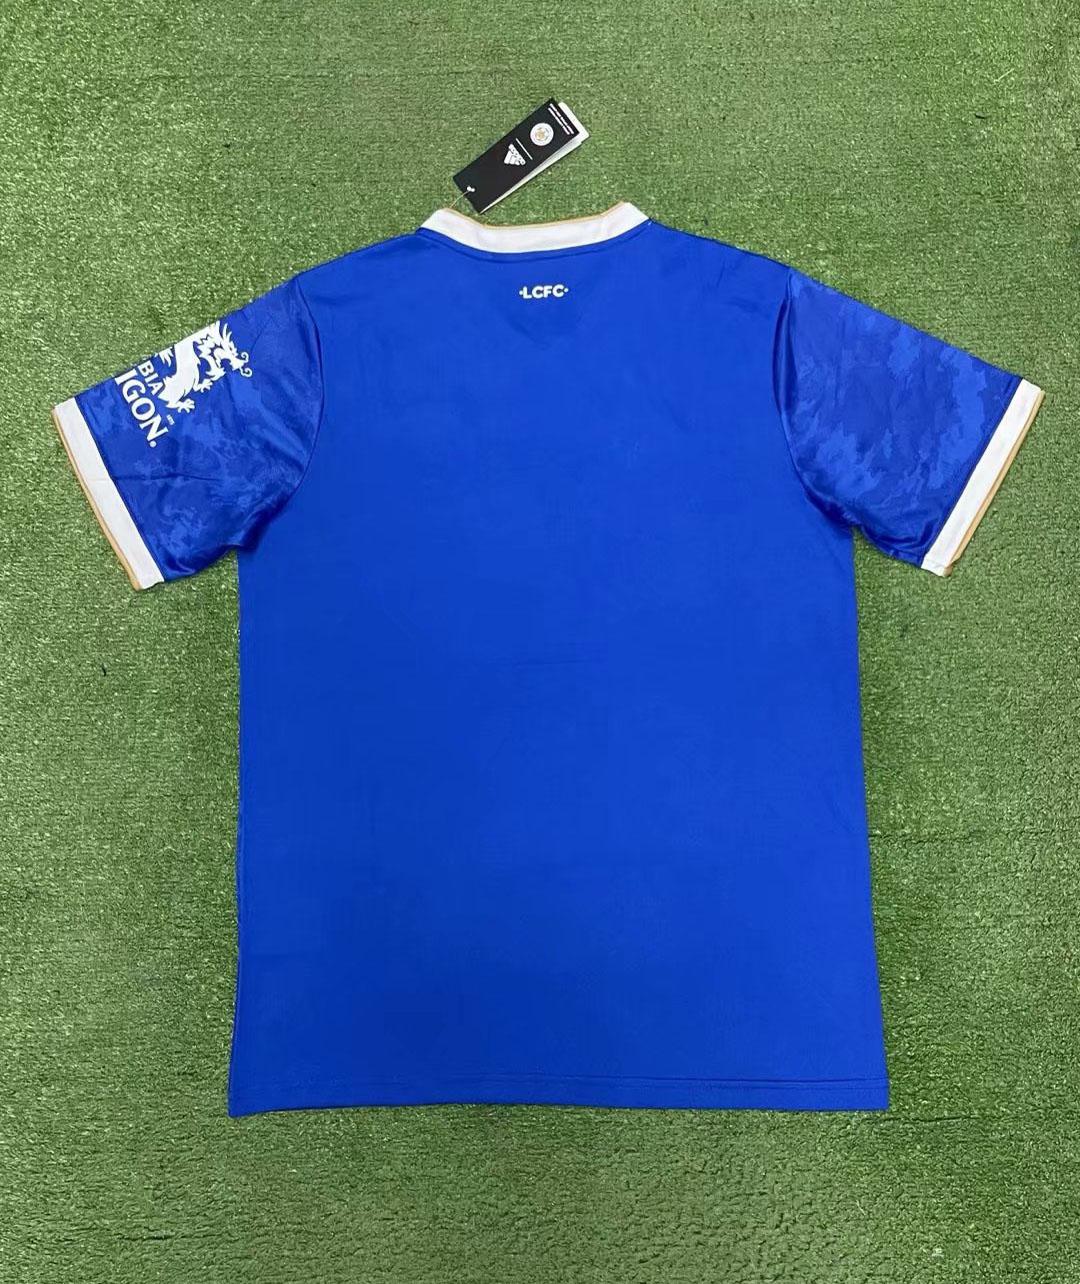 21-22-leicester-city-home-football-jersey-312.jpg